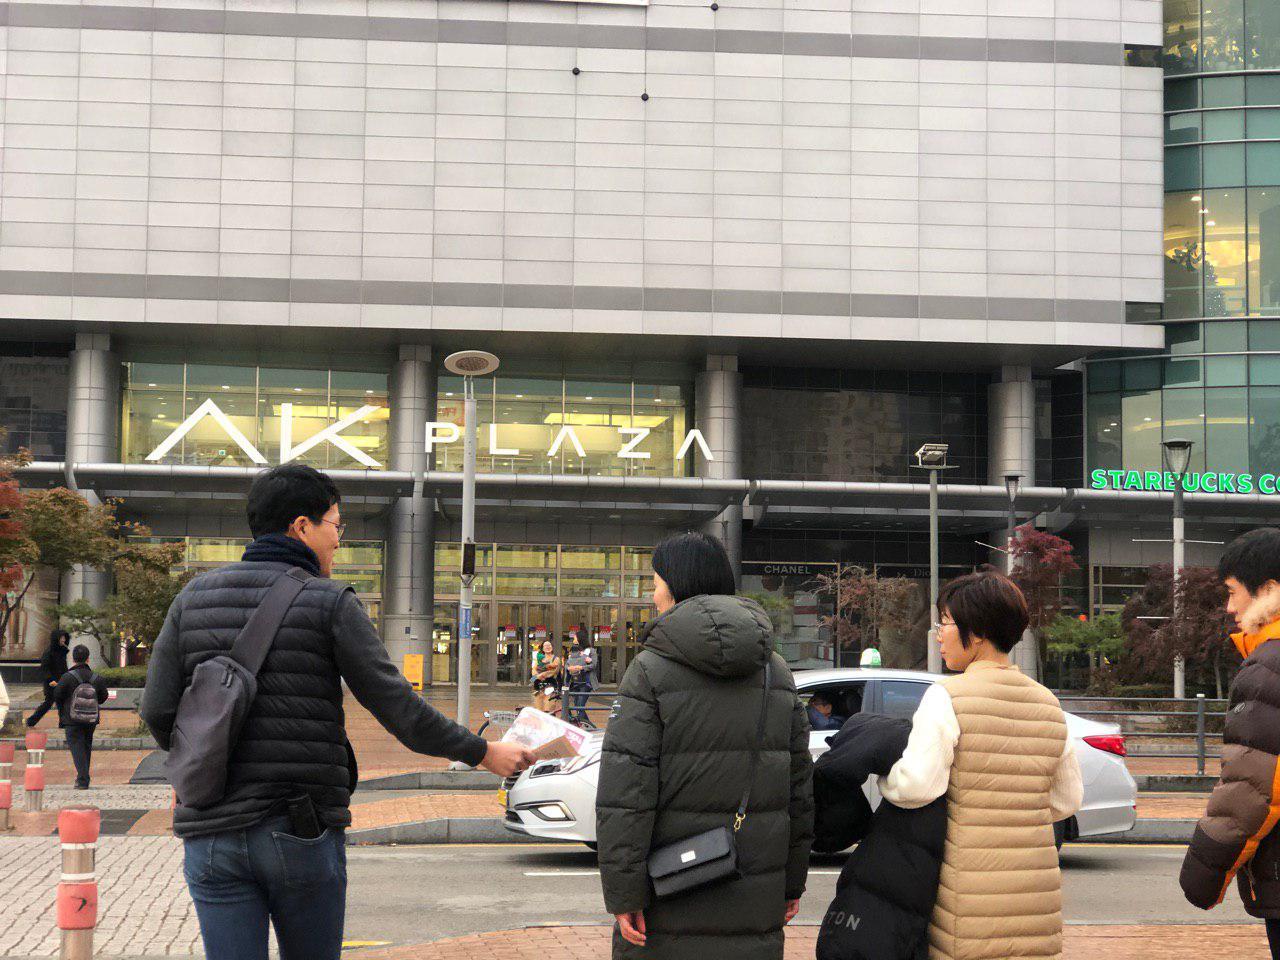 photo_2019-11-15_08-52-38.jpg